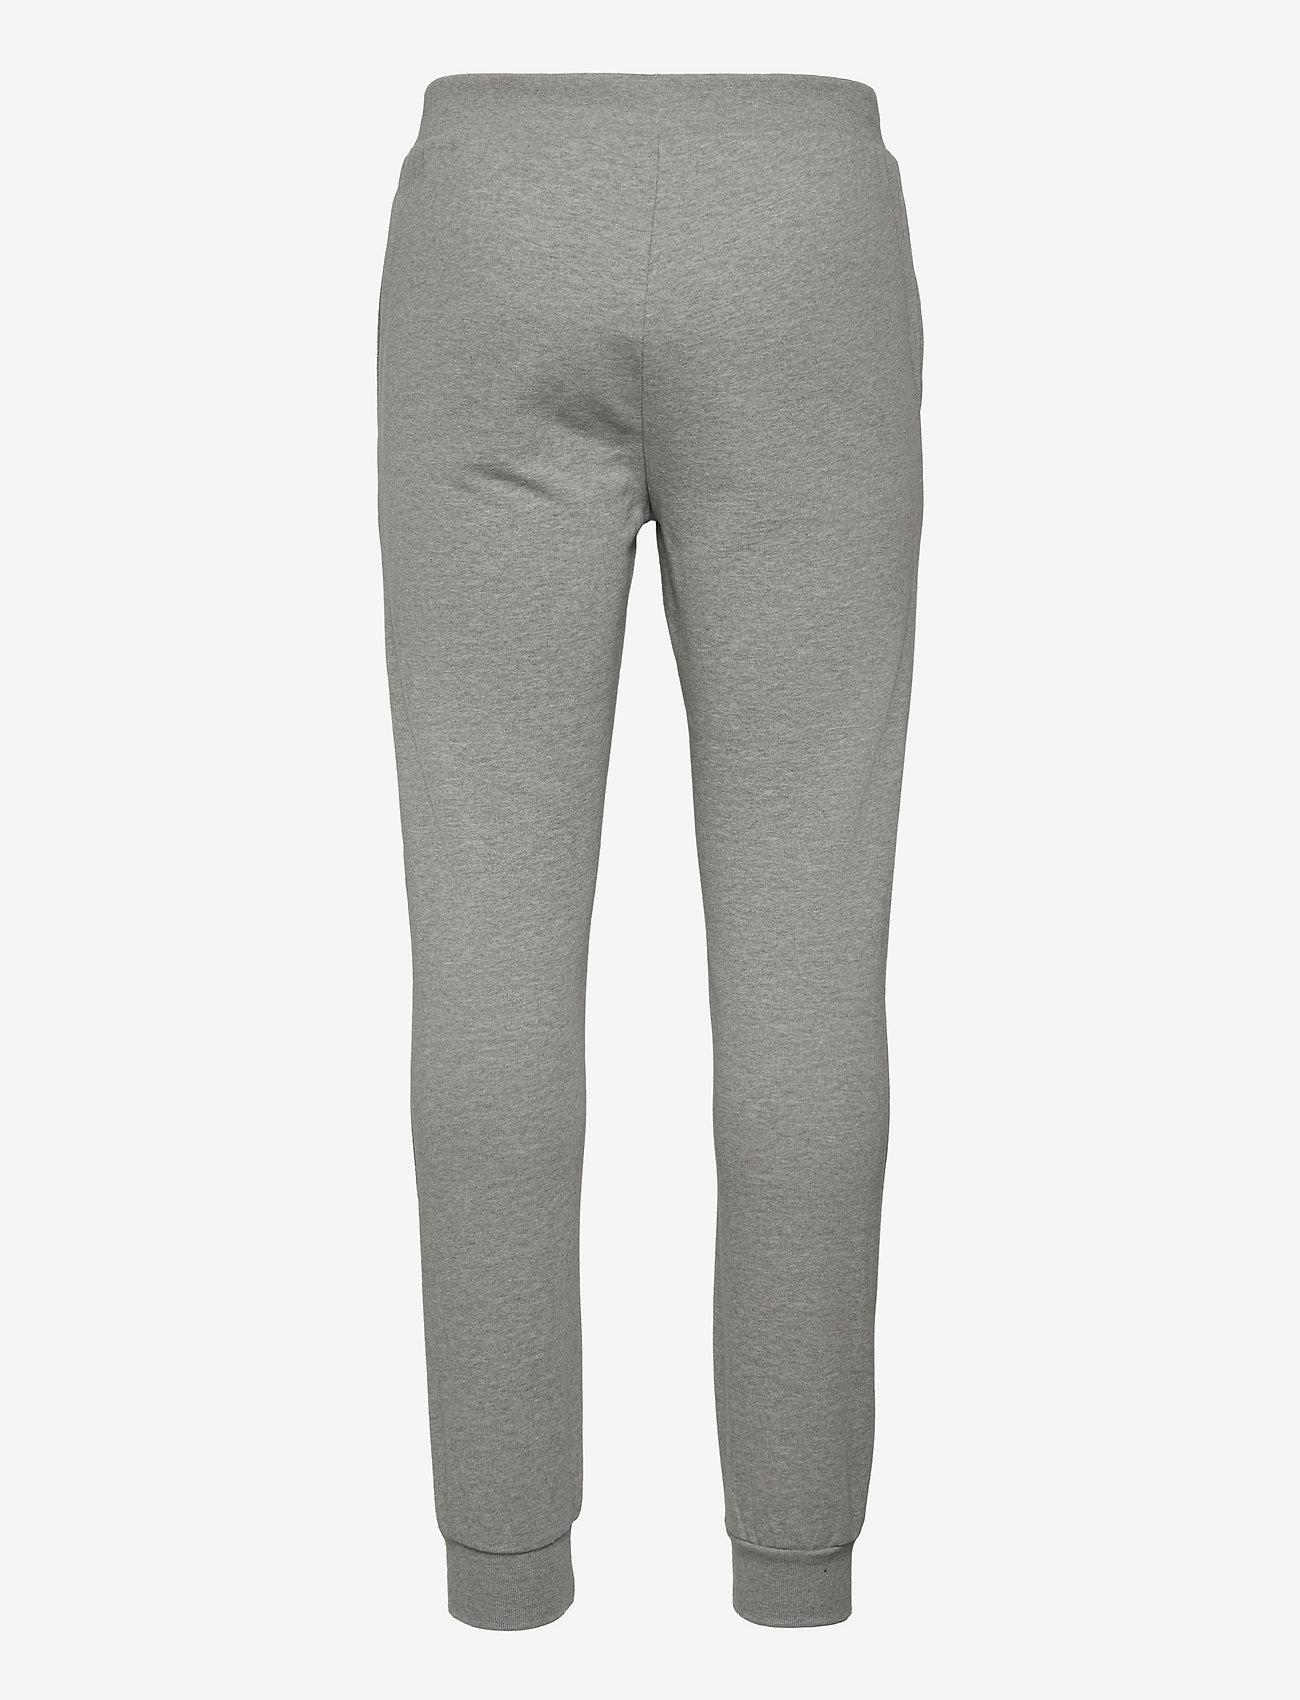 Knowledge Cotton Apparel - TEAK sweat pants - GOTS/Vegan - kleding - grey melange - 1